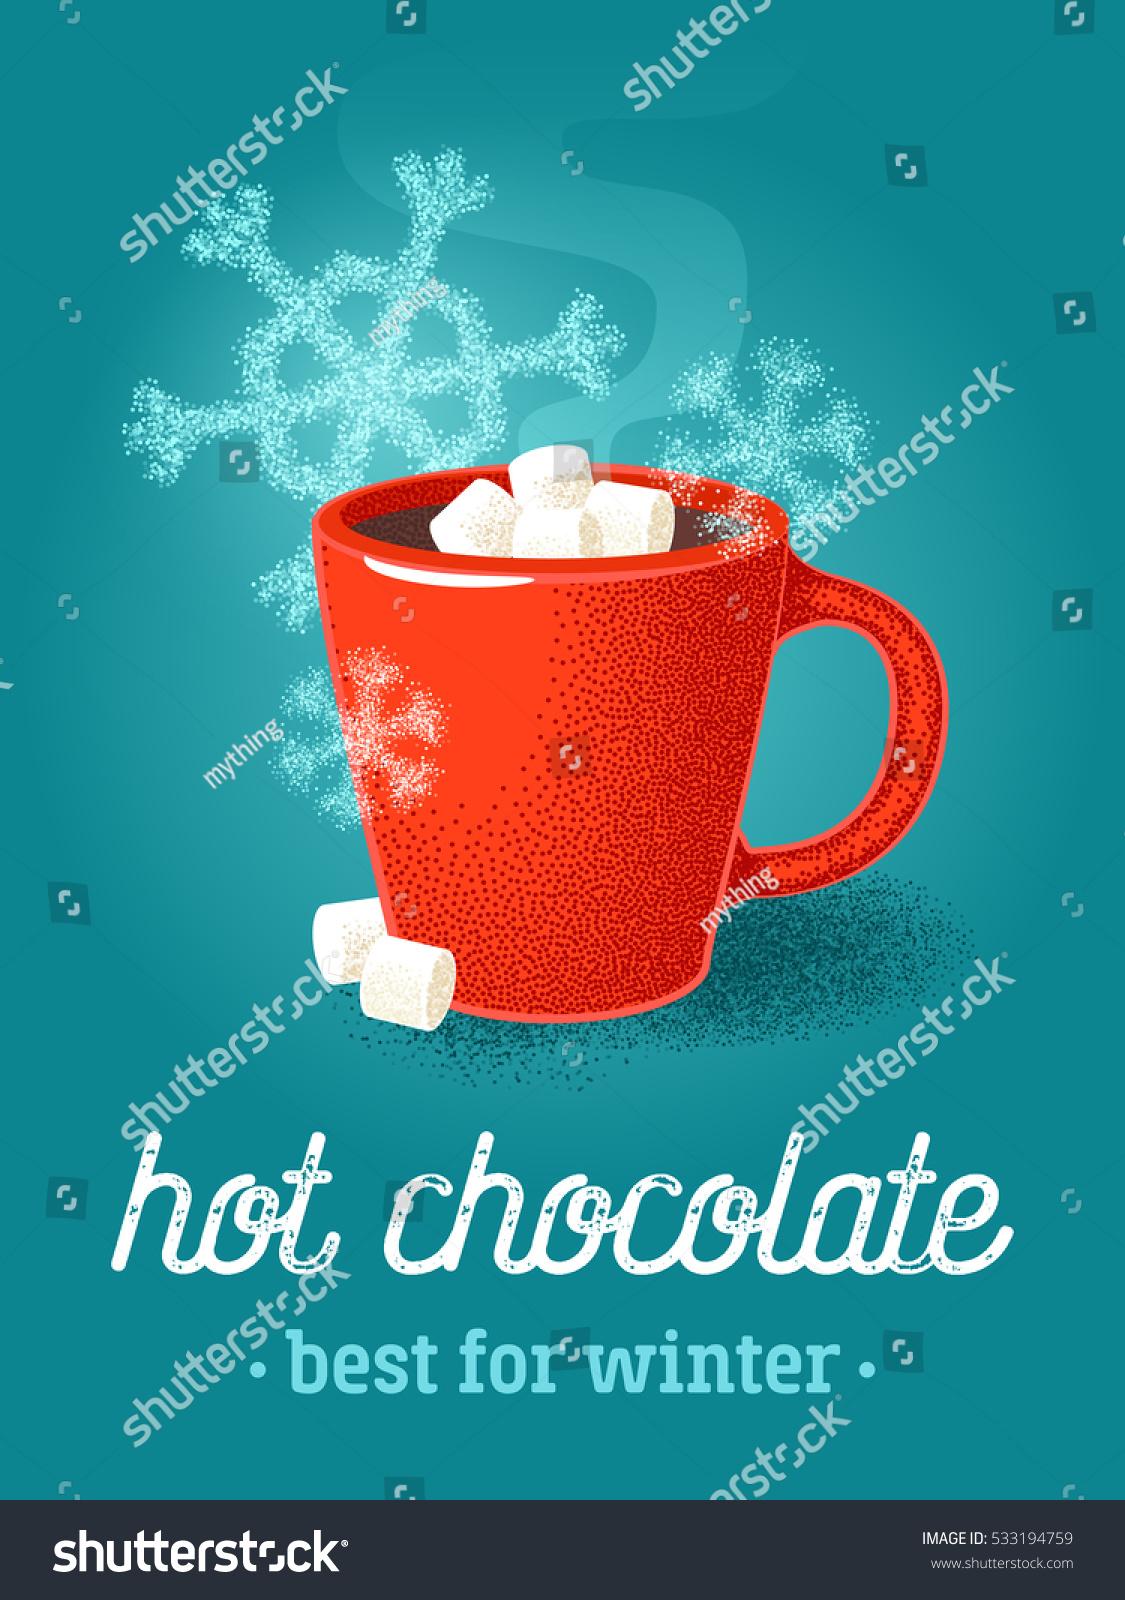 Colorful Poster Red Mug Hot Chocolate Stockvektorgrafik 533194759